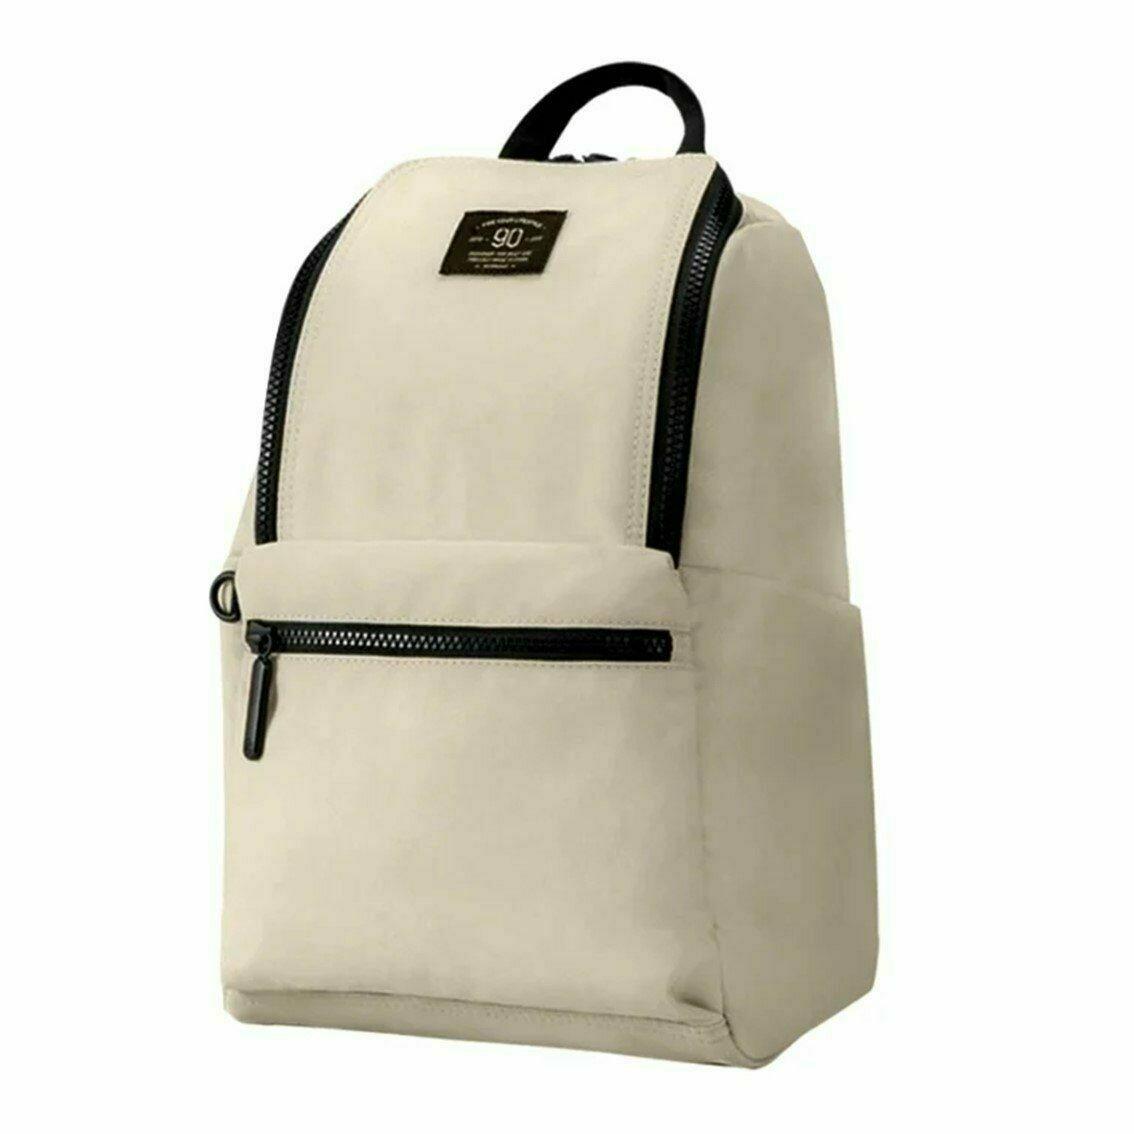 Рюкзак Xiaomi 90 points pro leisure travel backpack Бежевый